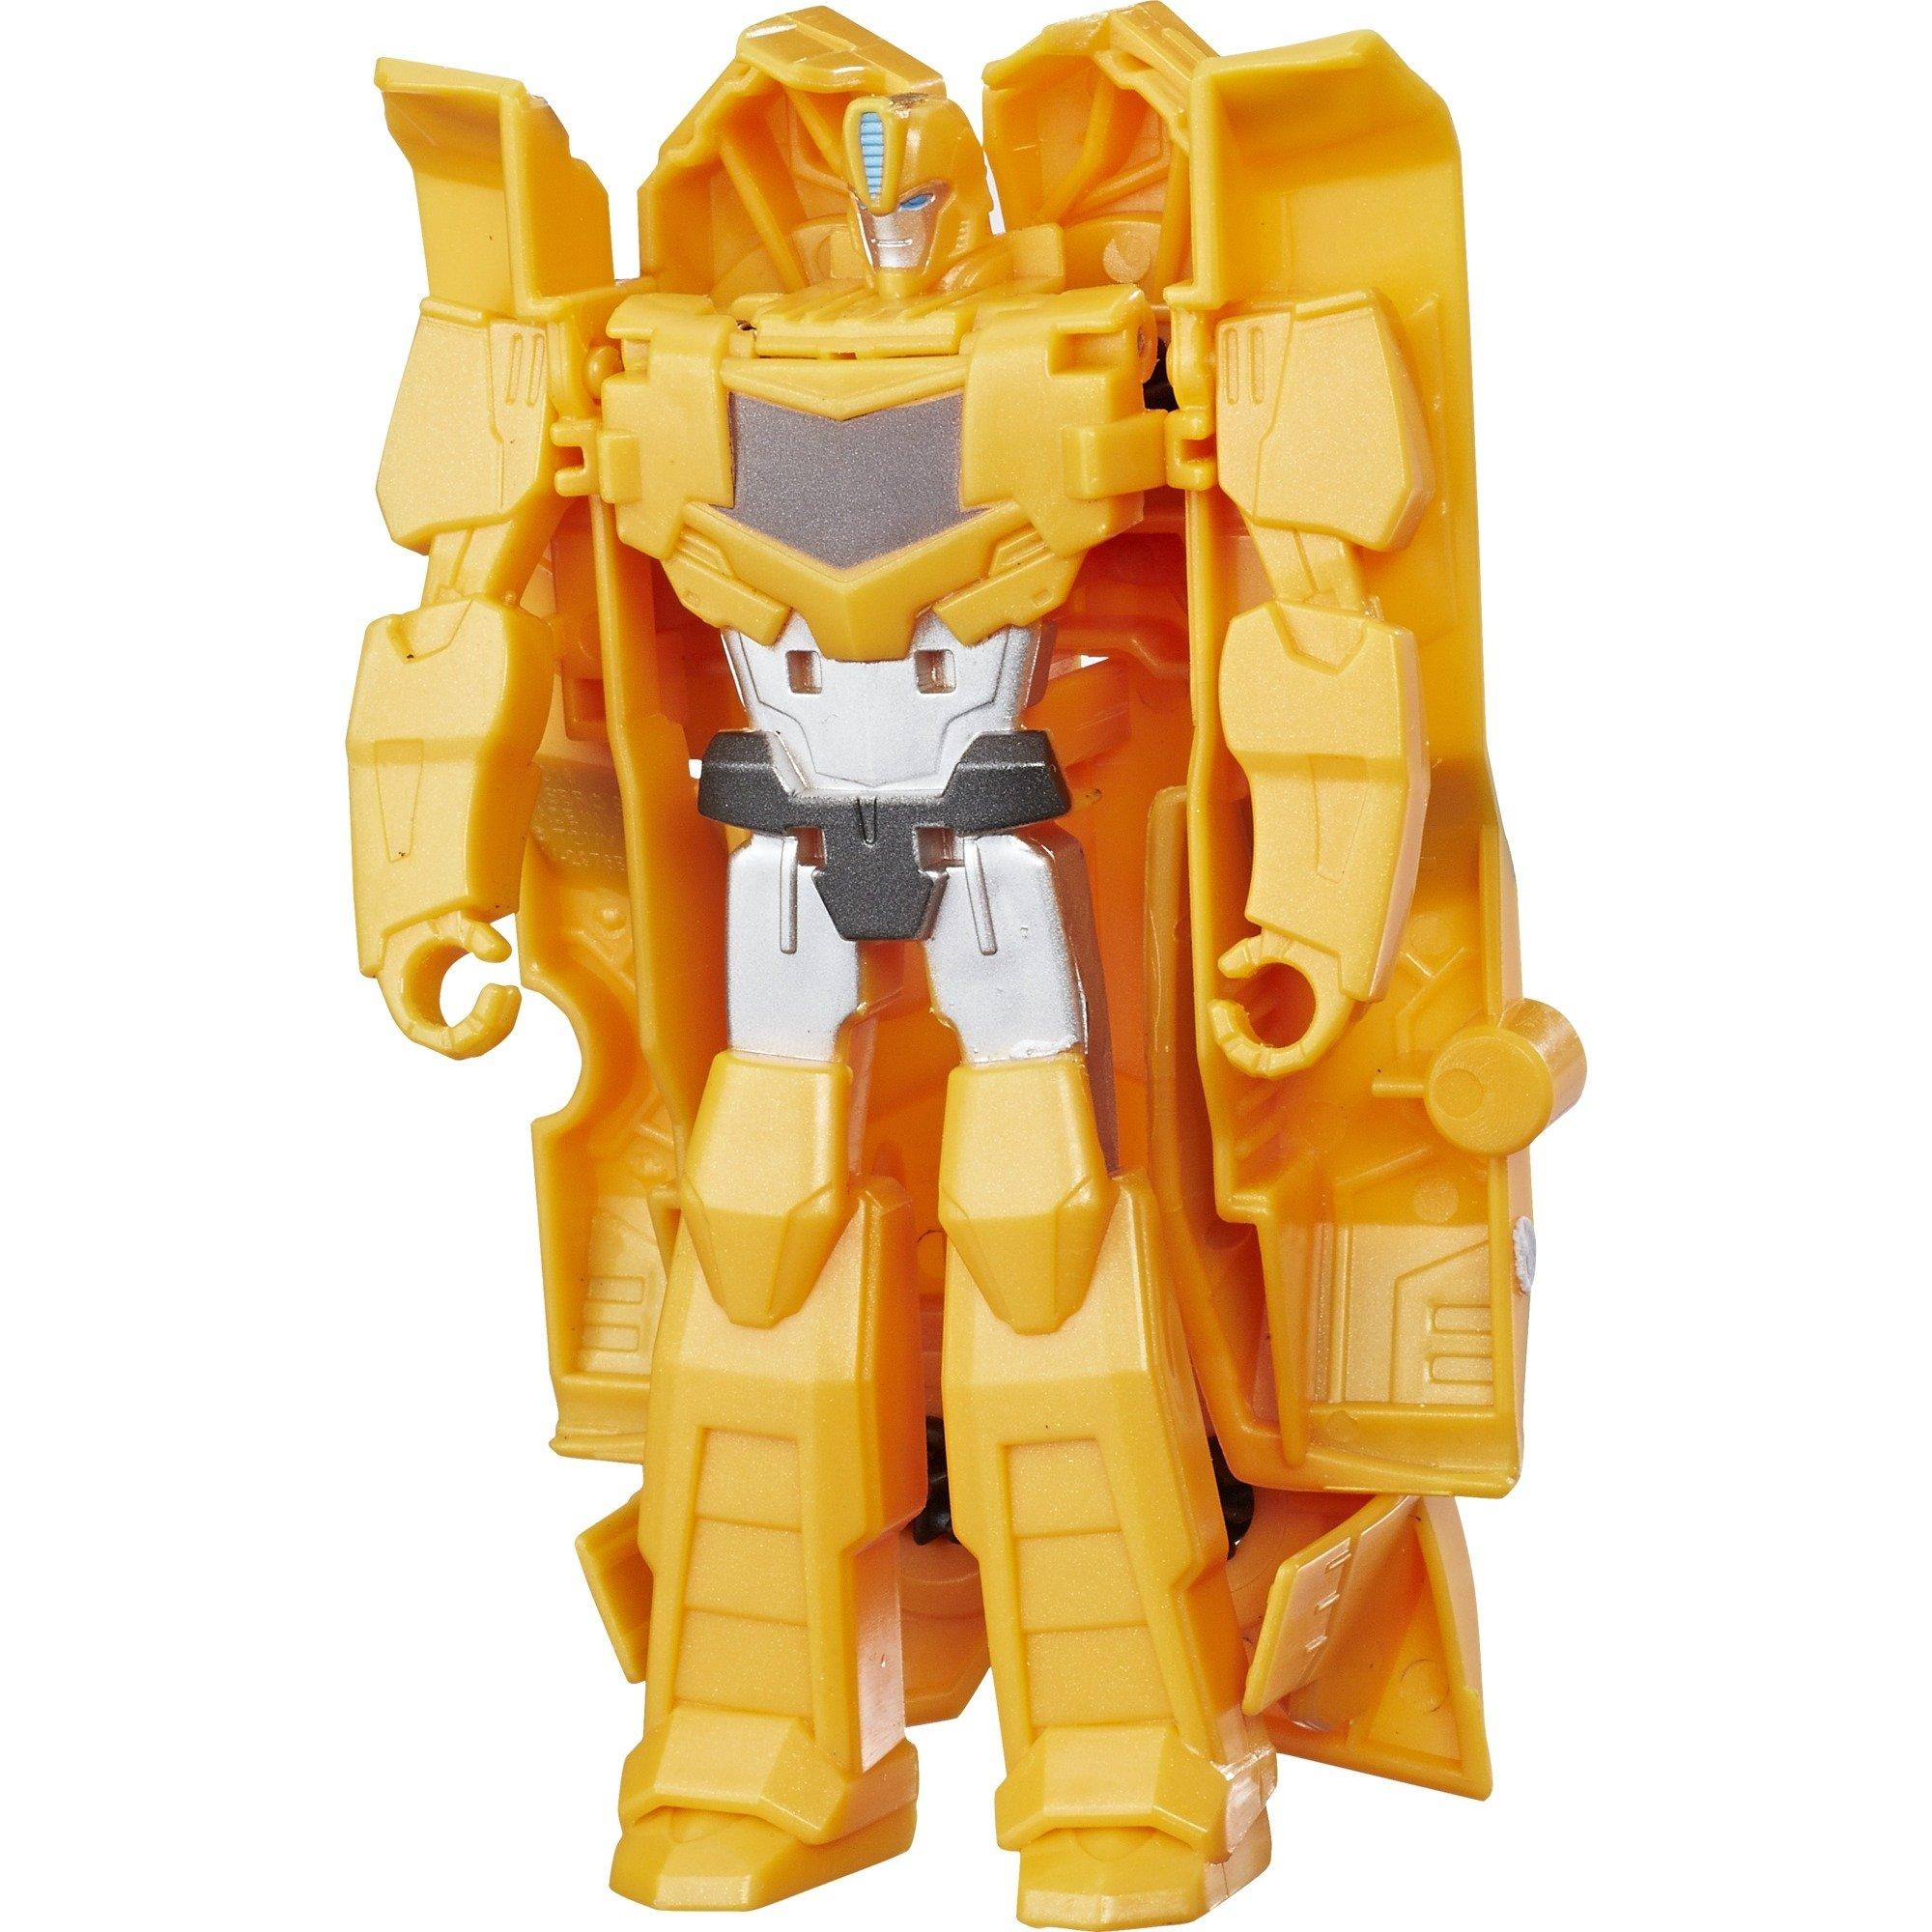 transformers-rid-1-step-changer-bumblebee-spil-figur